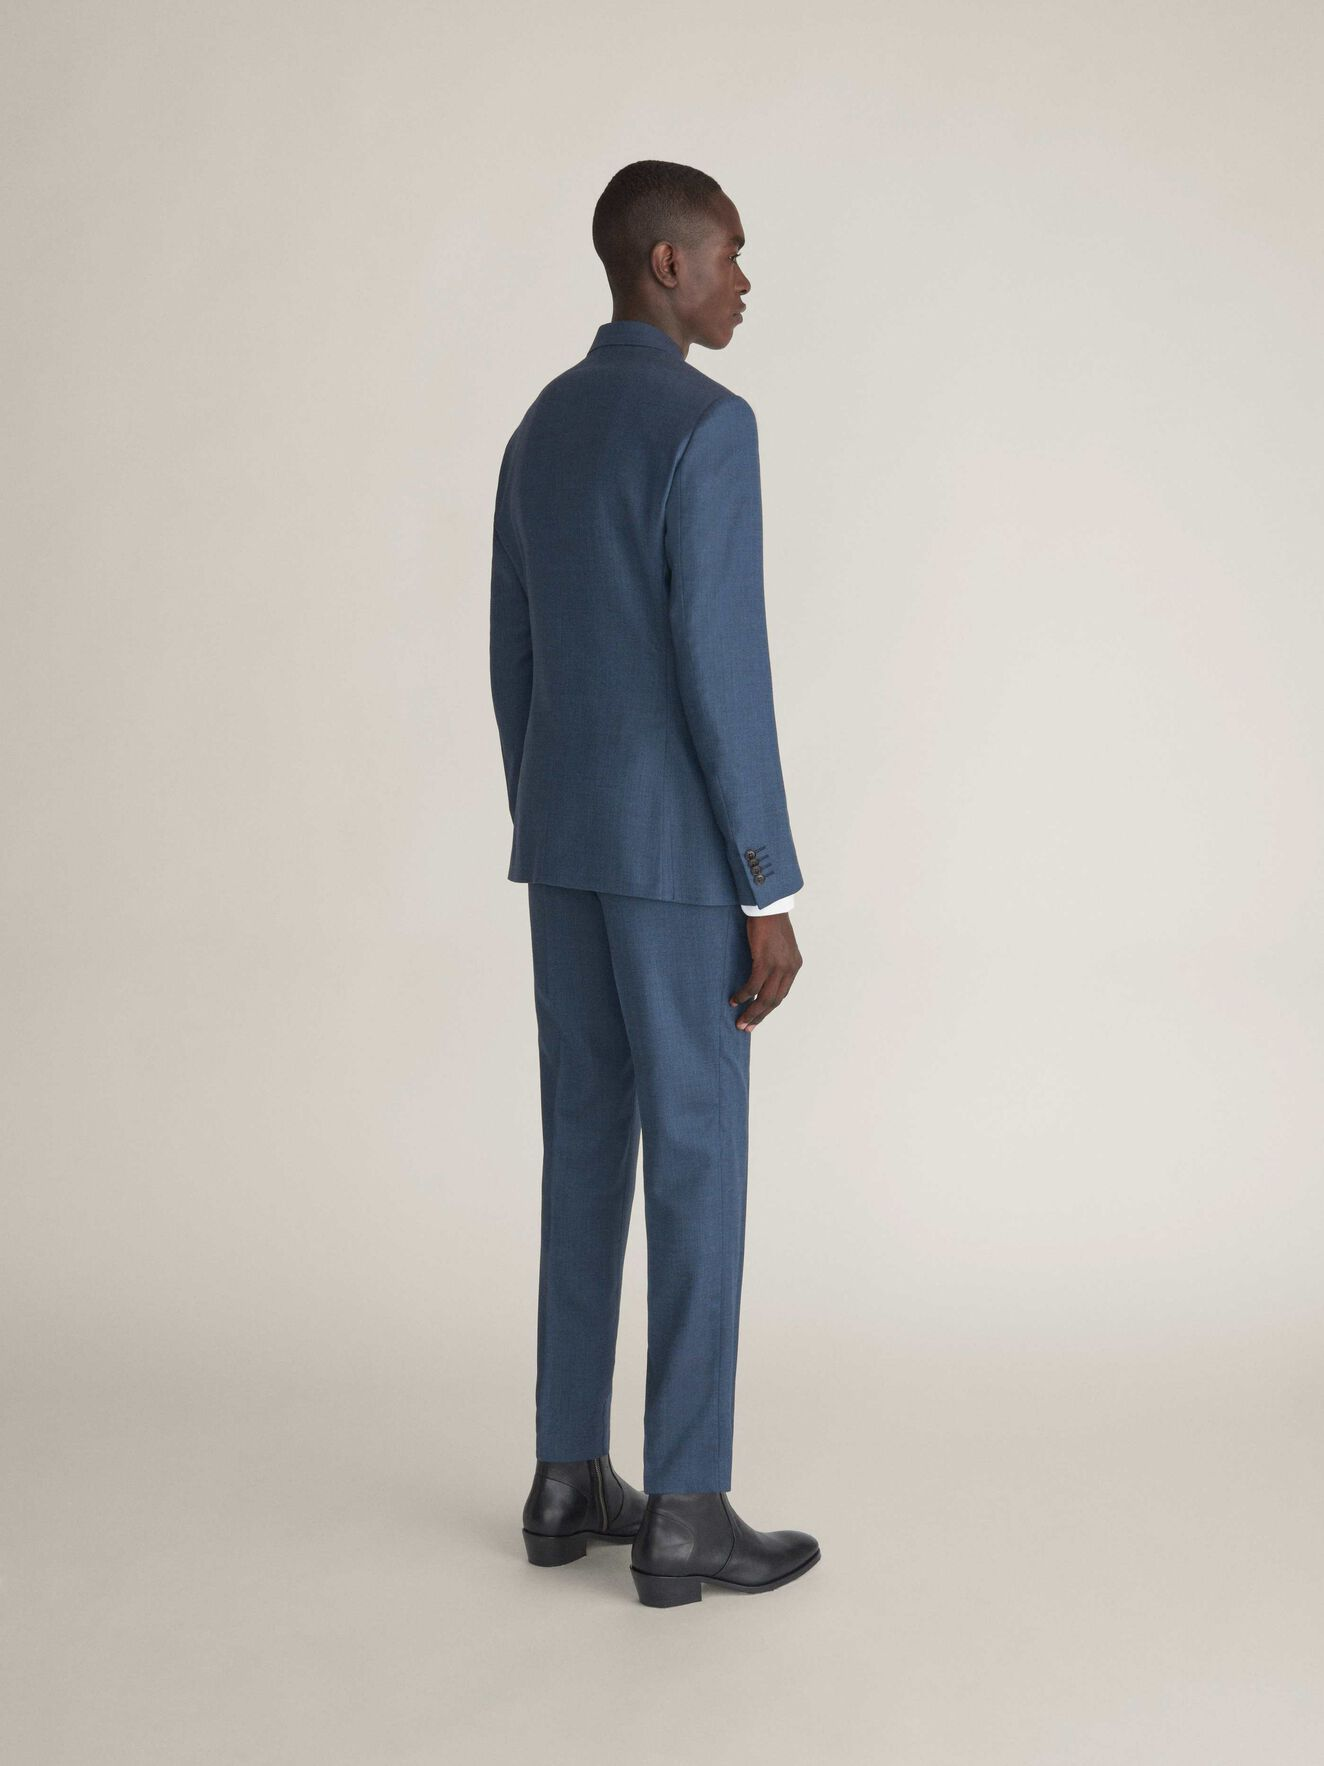 Jamonte Blazer in Silver Blue from Tiger of Sweden